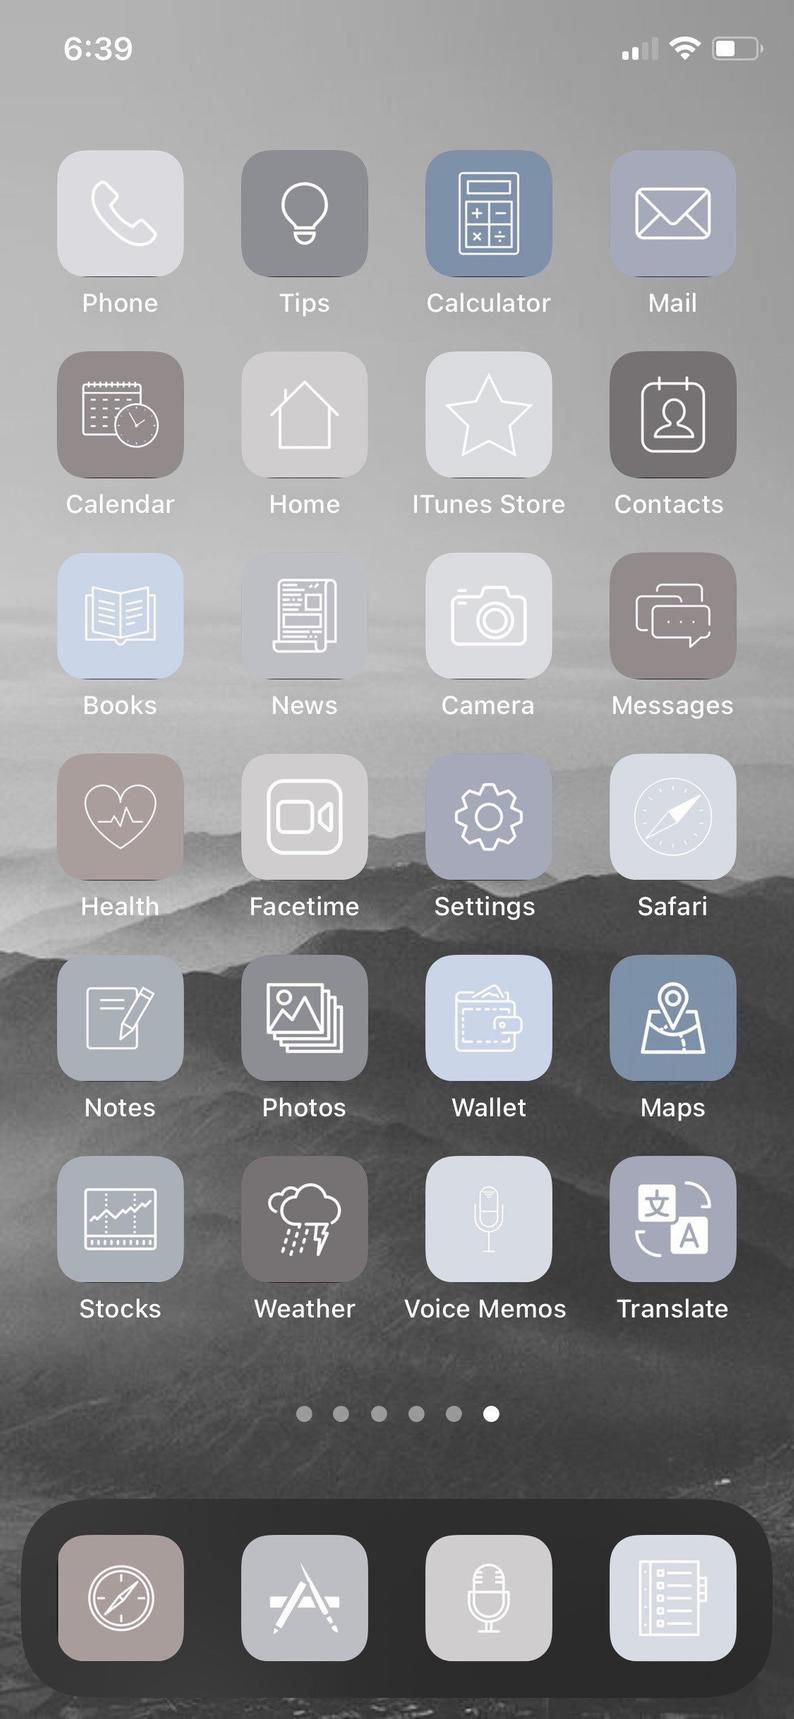 70 Cool Grey Gray Ios 14 Minimalist Boho Neutral App Icons Bundle Set In 2020 App Icon Iphone App Design Iphone Apps